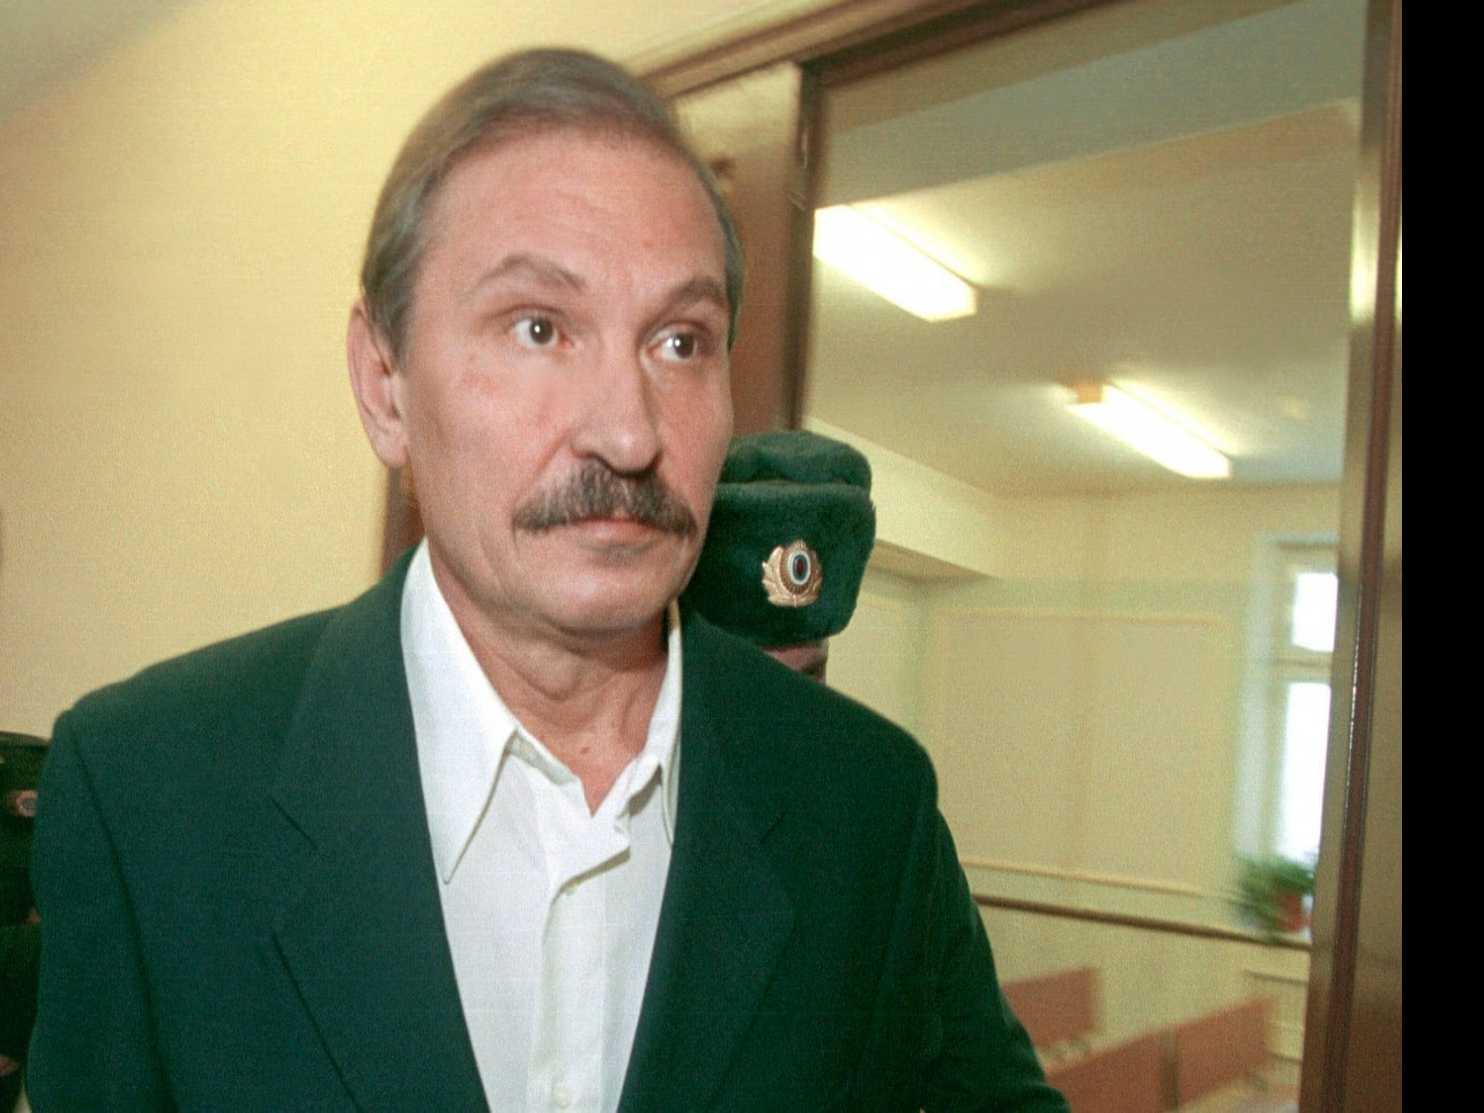 UK Opens Murder Probe into Death of Russian Nikolai Glushkov